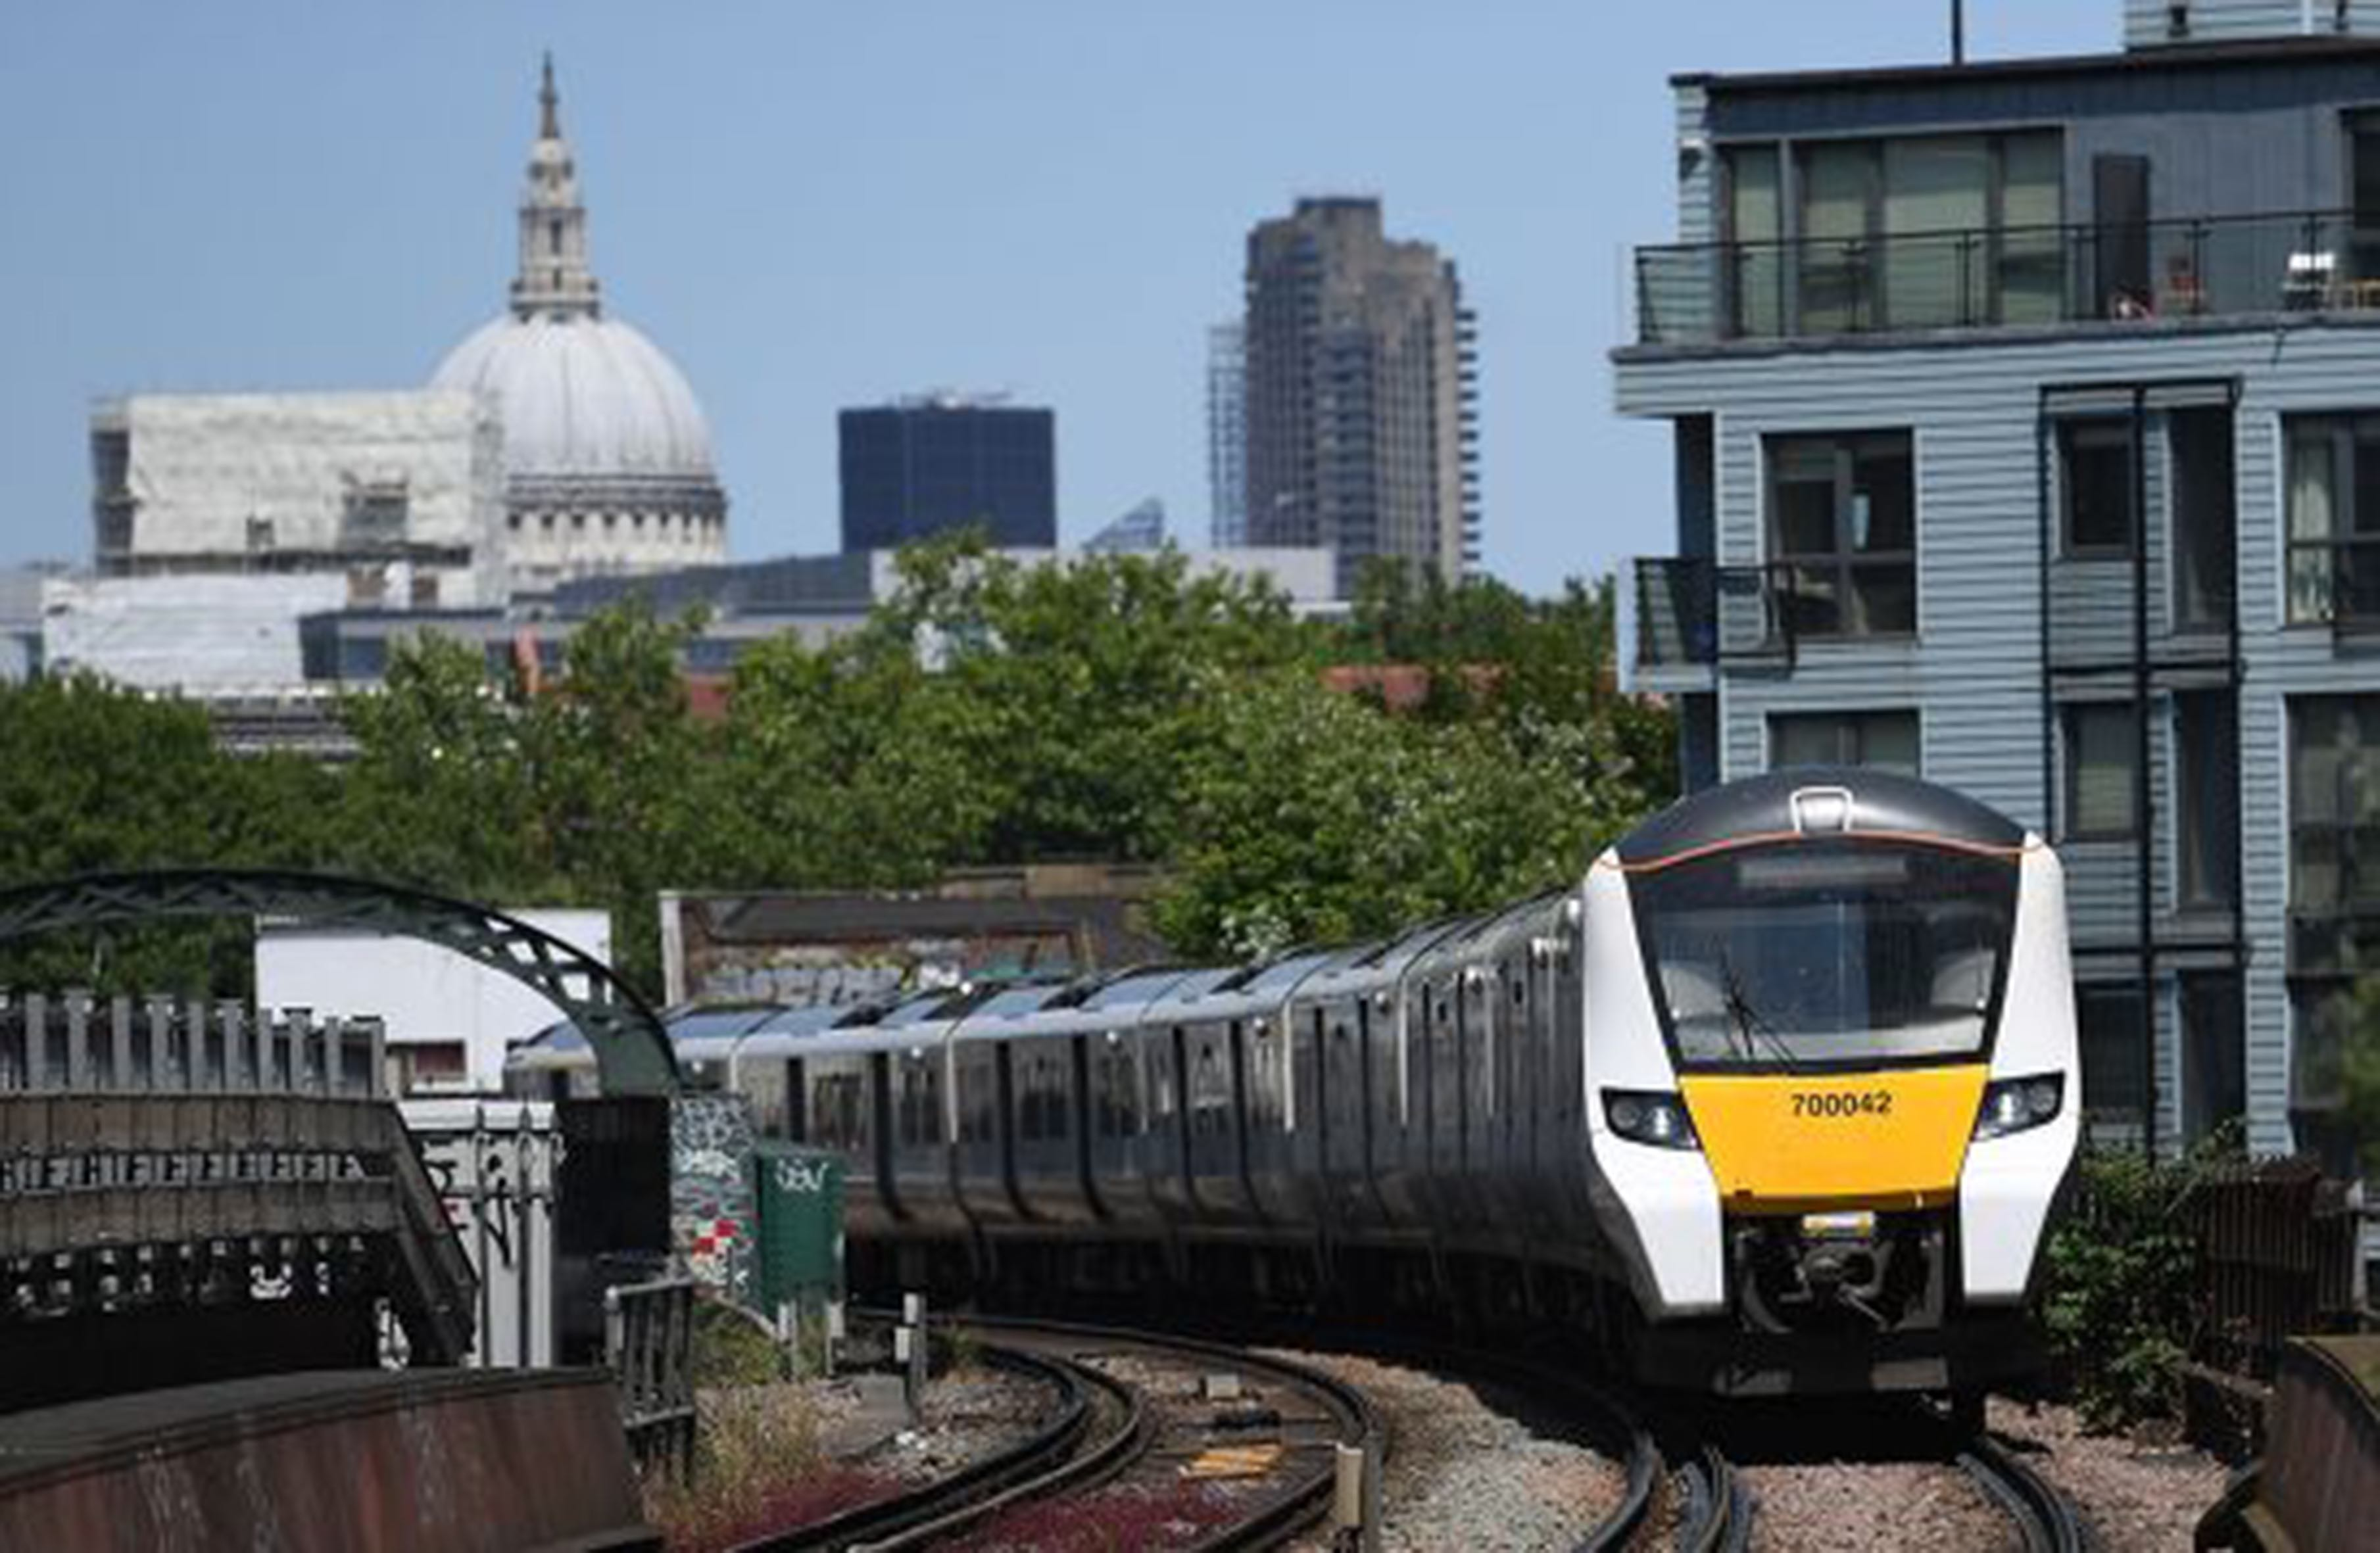 Govia Thameslink train, London